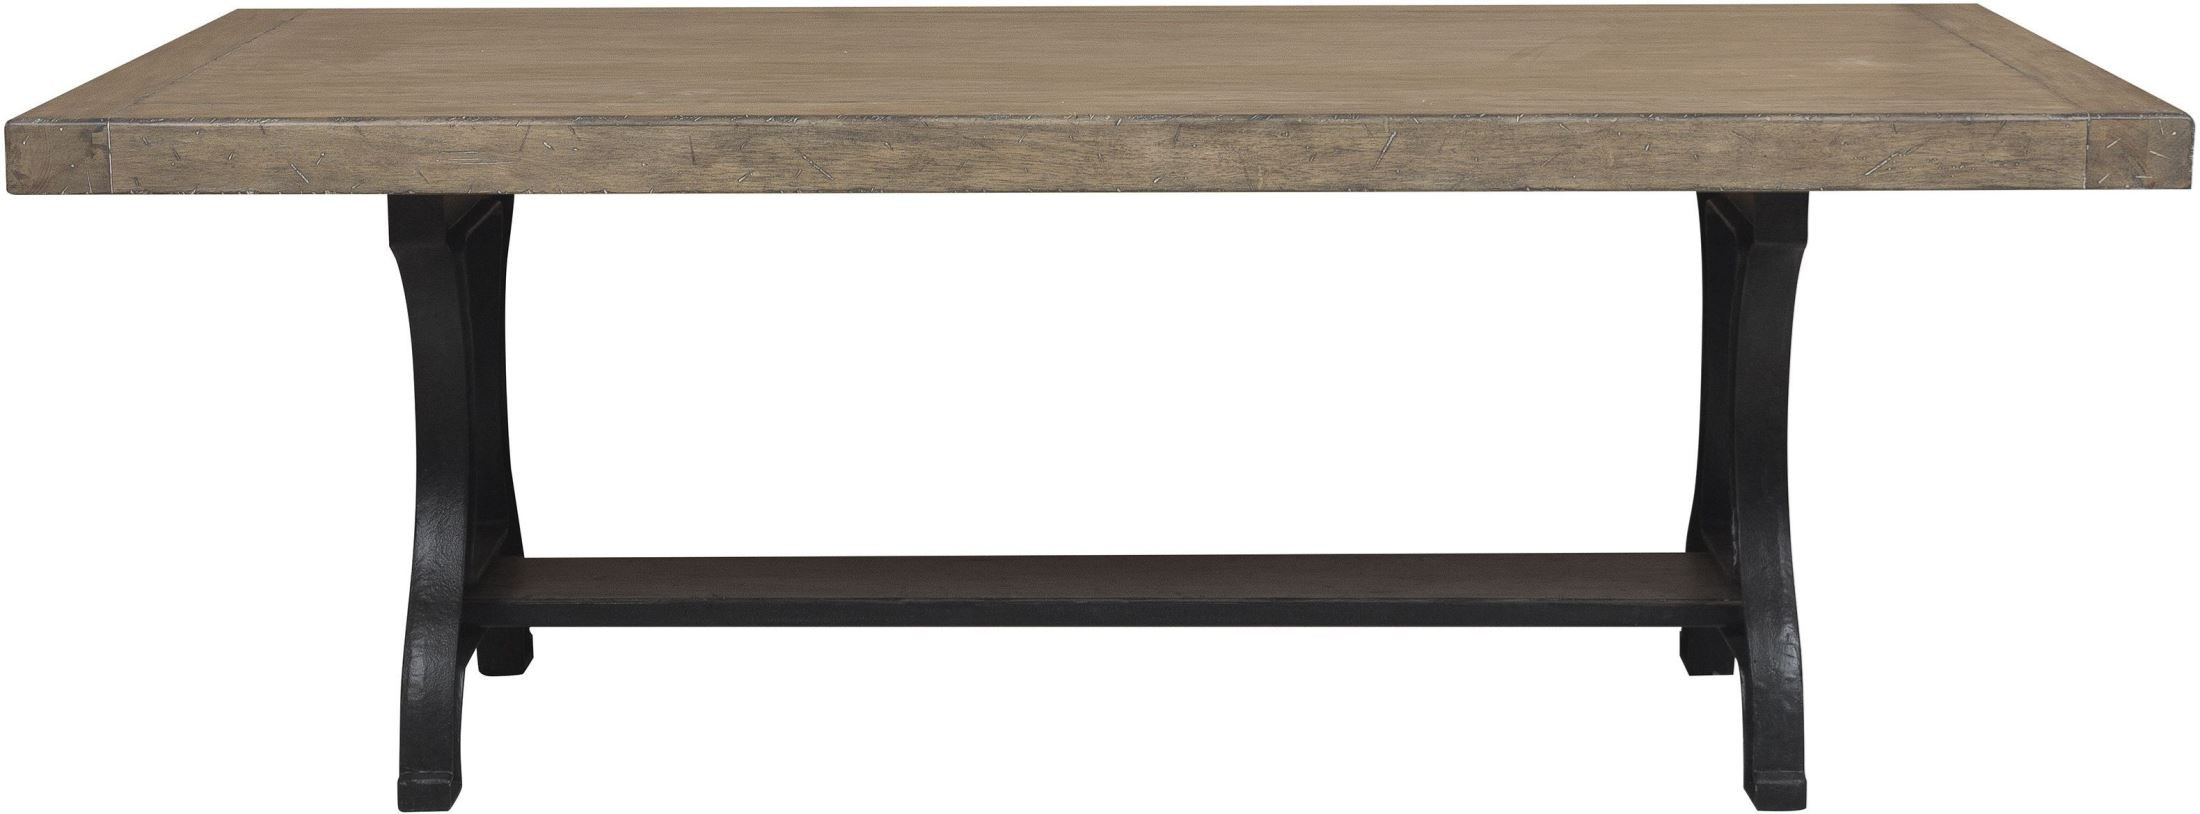 Flatbush brown cast rectangular pedestal dining table for Rectangular pedestal dining table